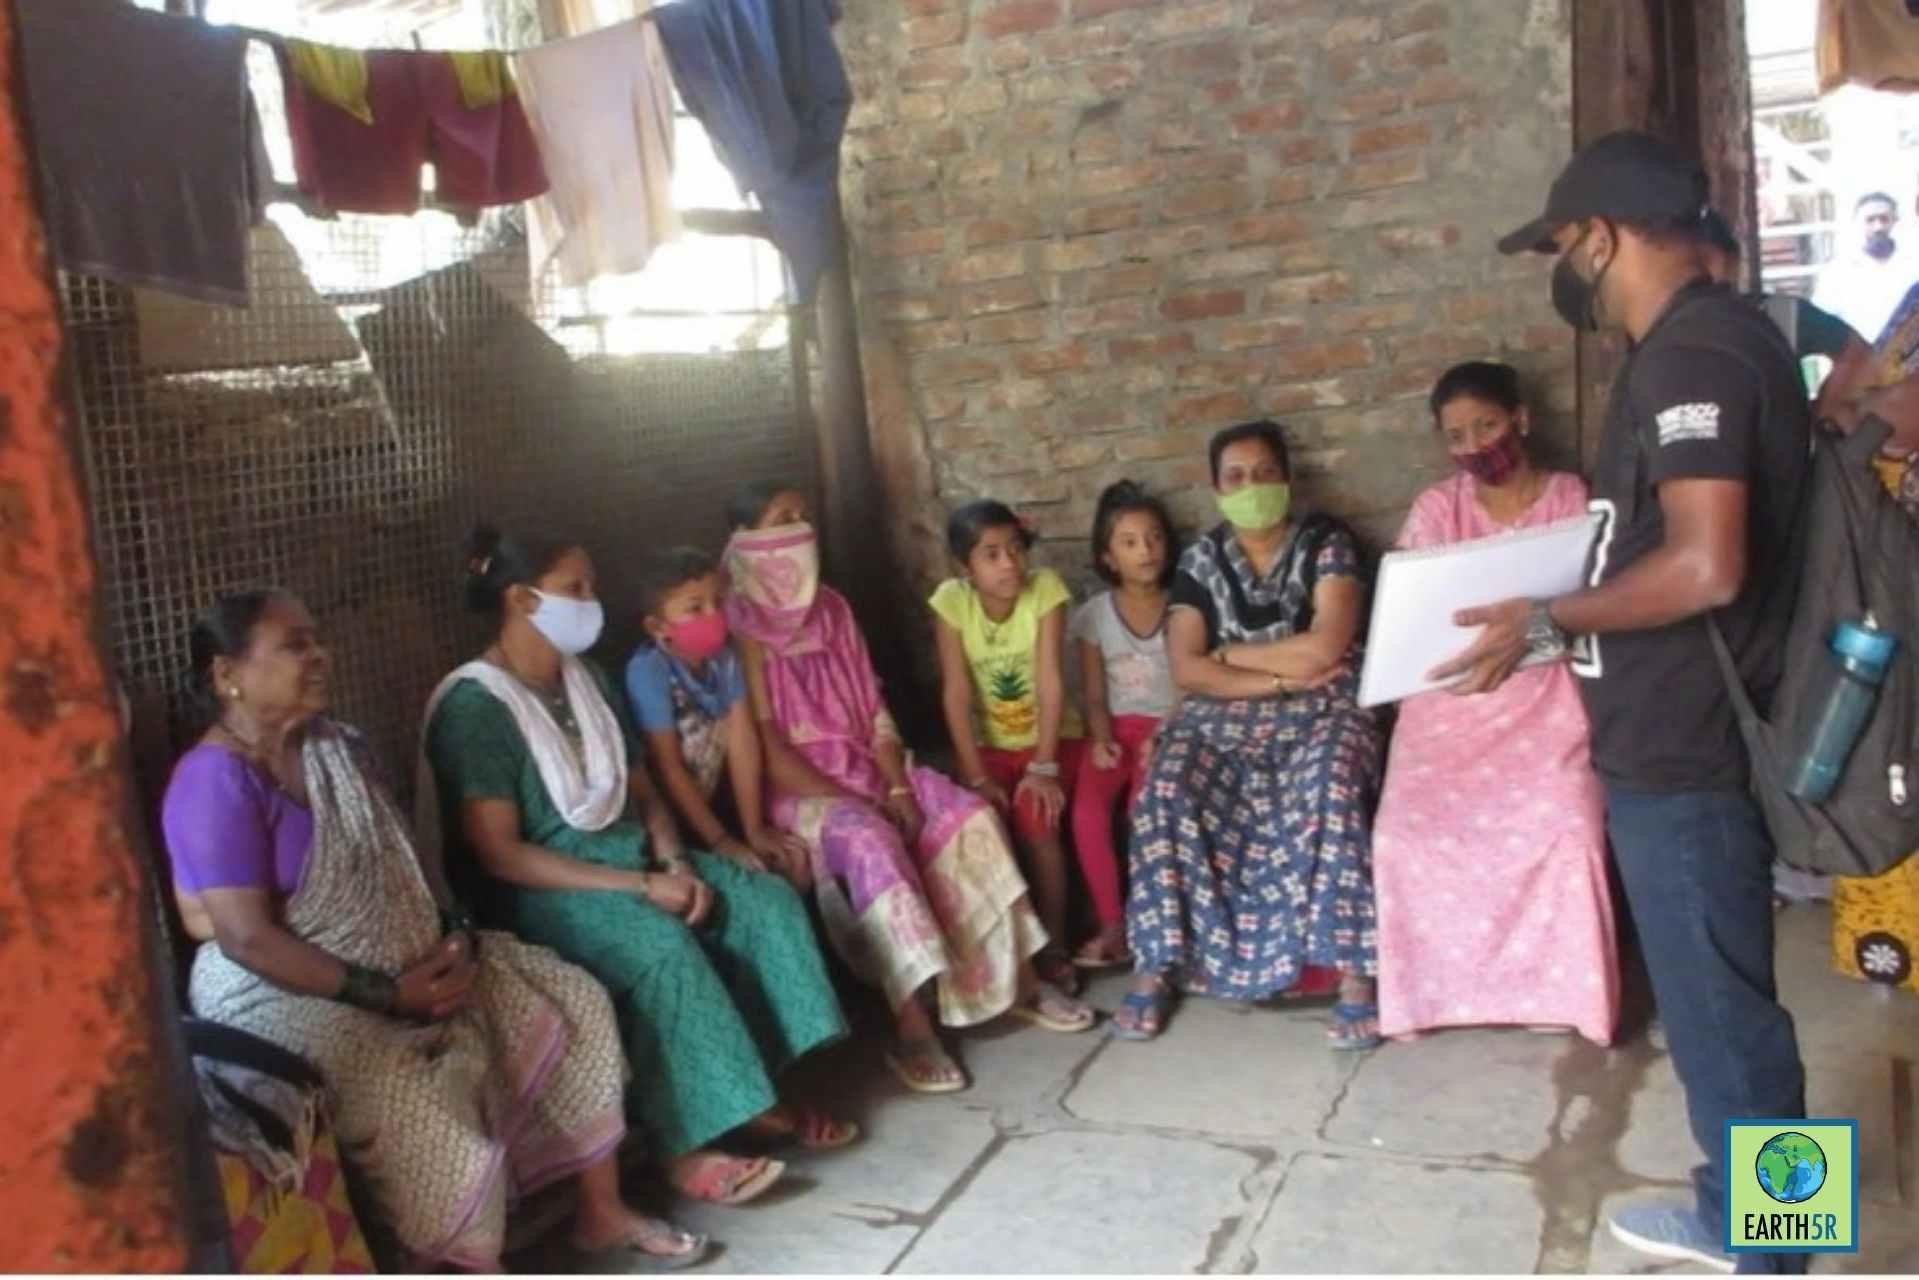 Mithi-River-Pollution-Mumbai-India-Environmental-NGO-Earth5R-Community-Training-Livelihood-circular-economy